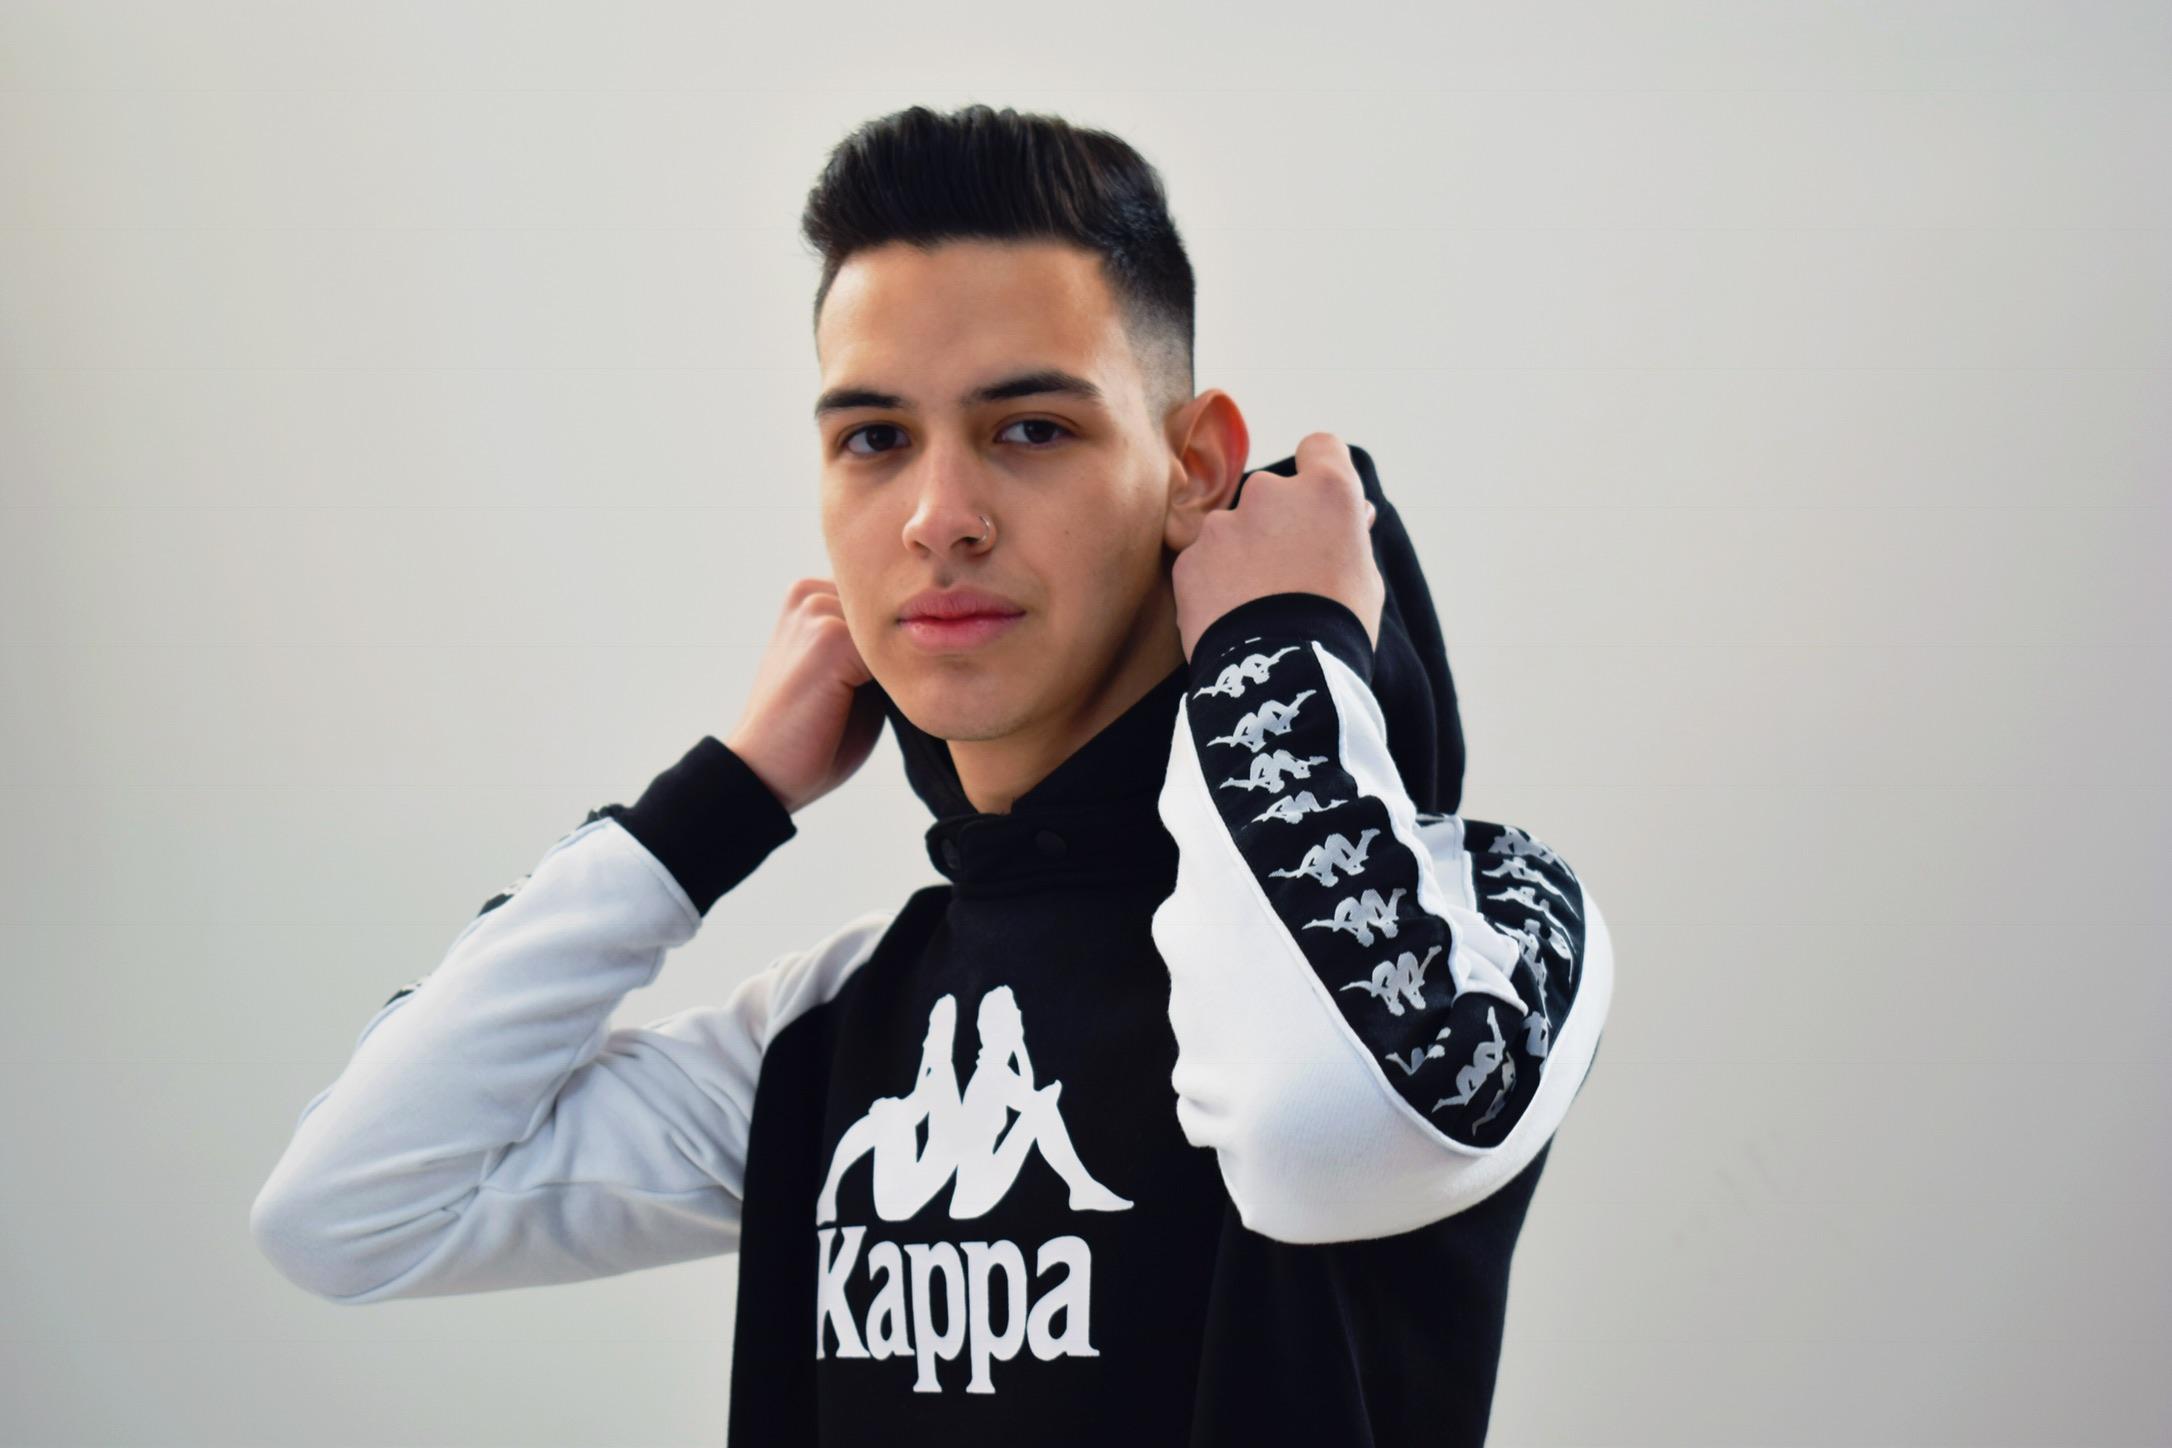 Sudadera Kappa negra y blanca 4elementos ourense